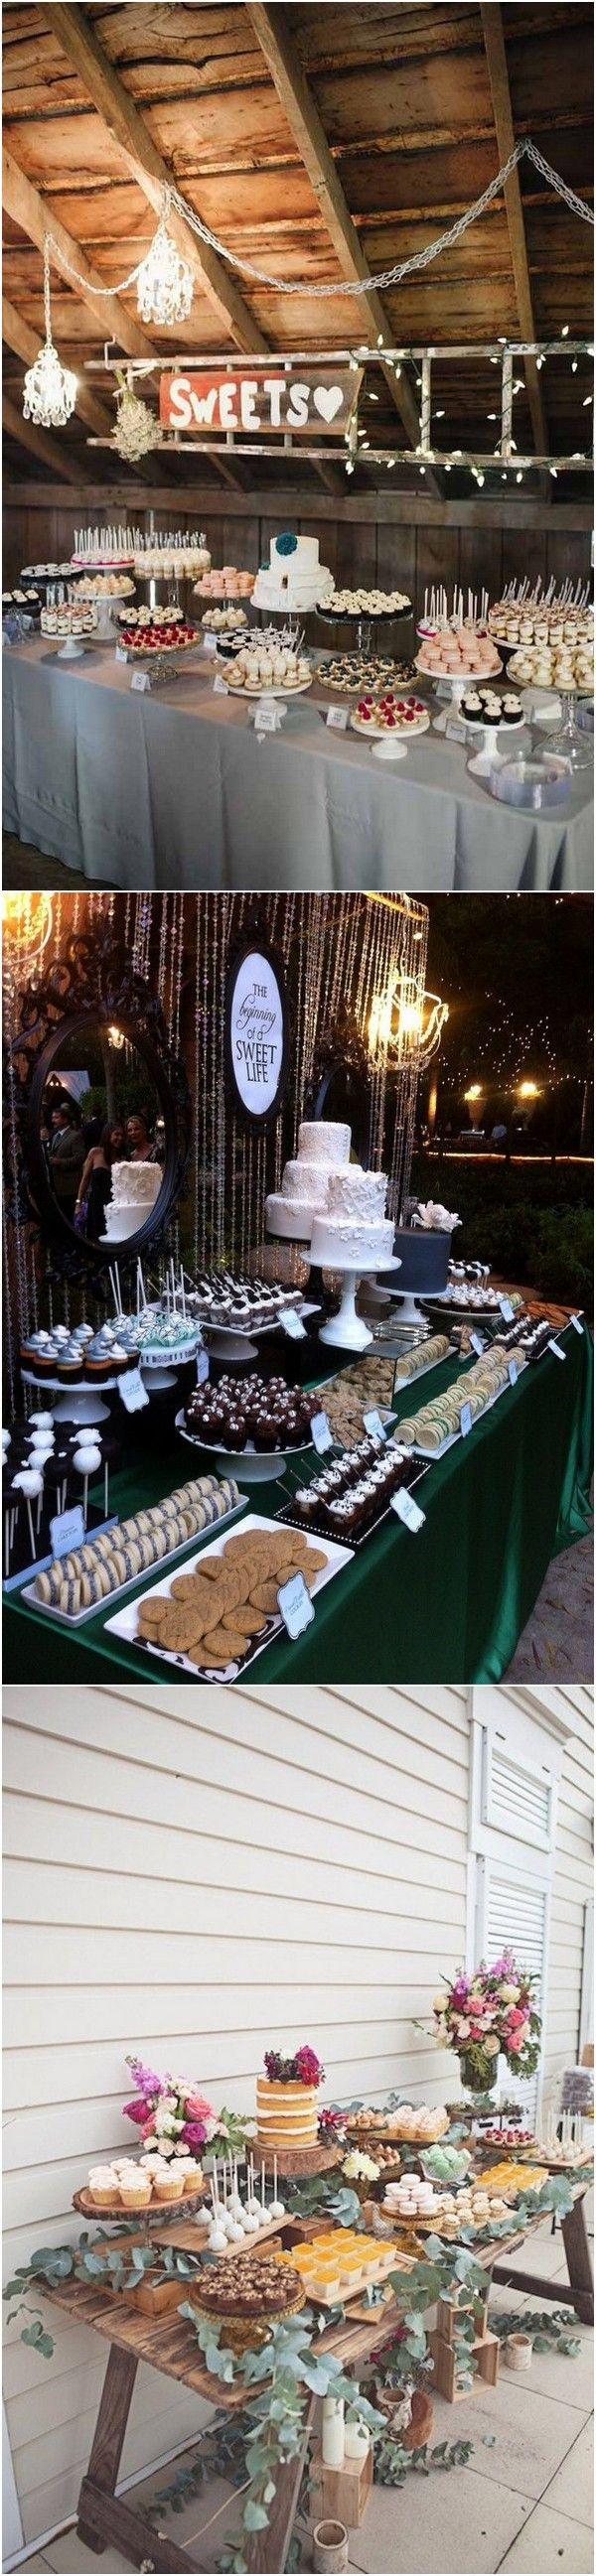 rustic wedding dessert table decorations